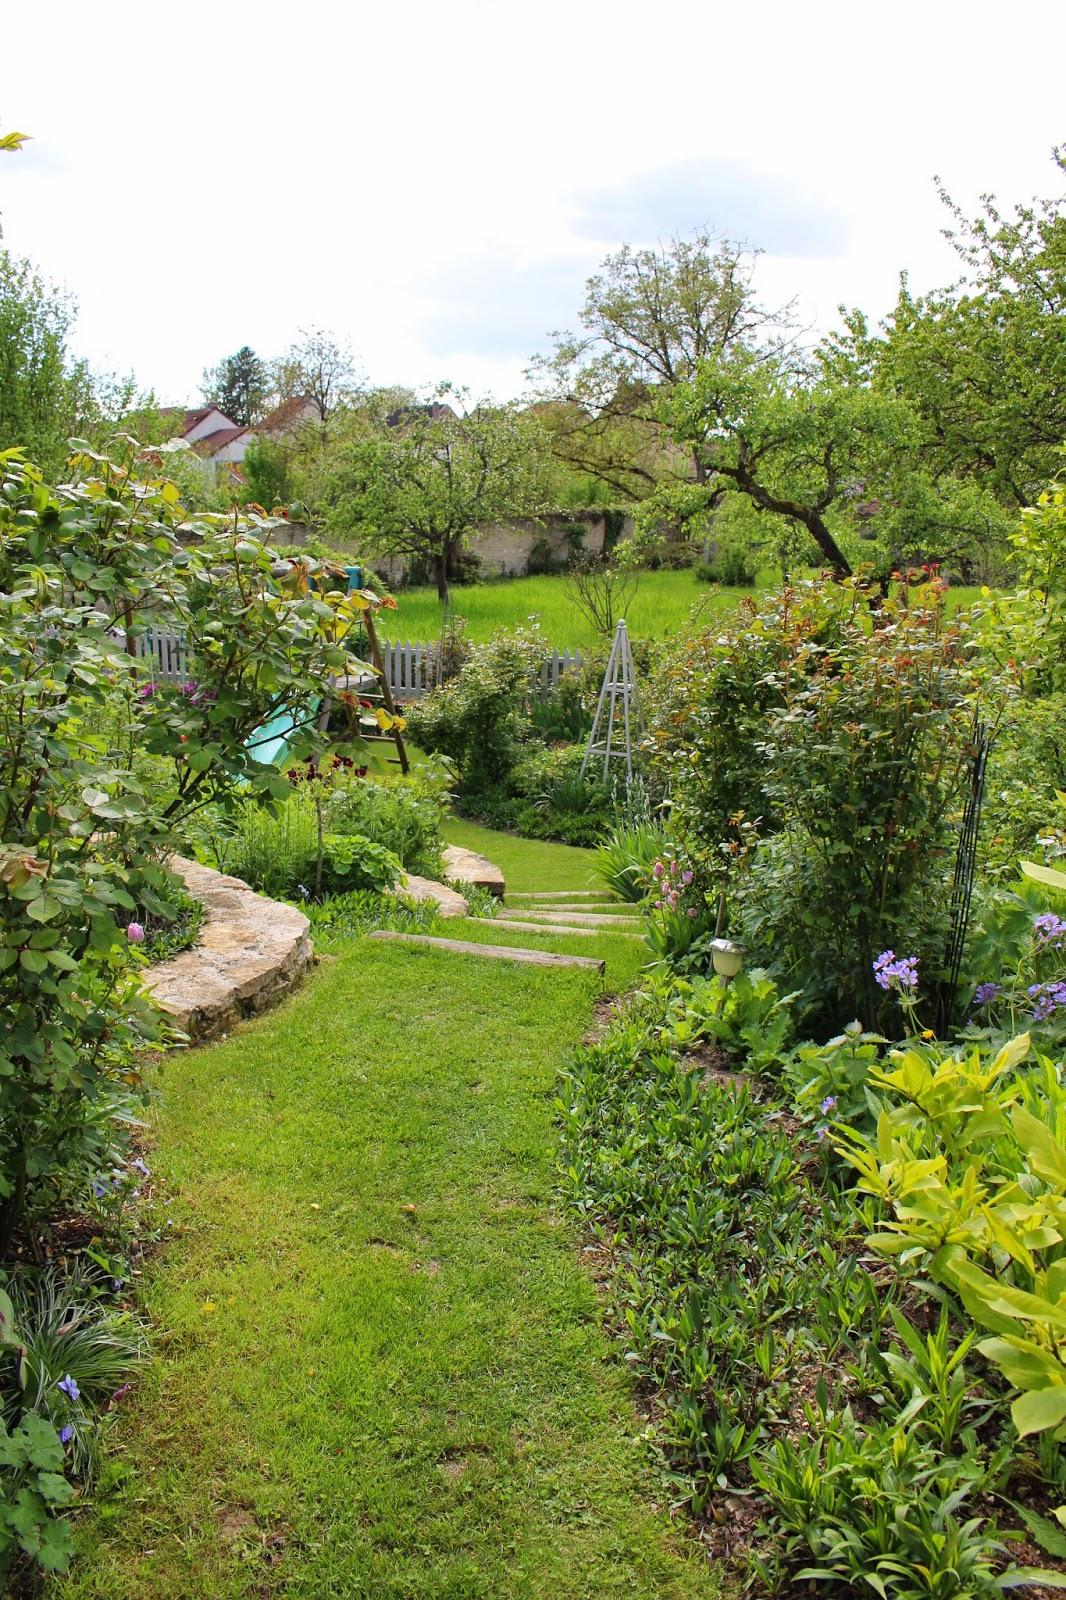 Notre jardin secret let the sun shine for Jardin secret 2015